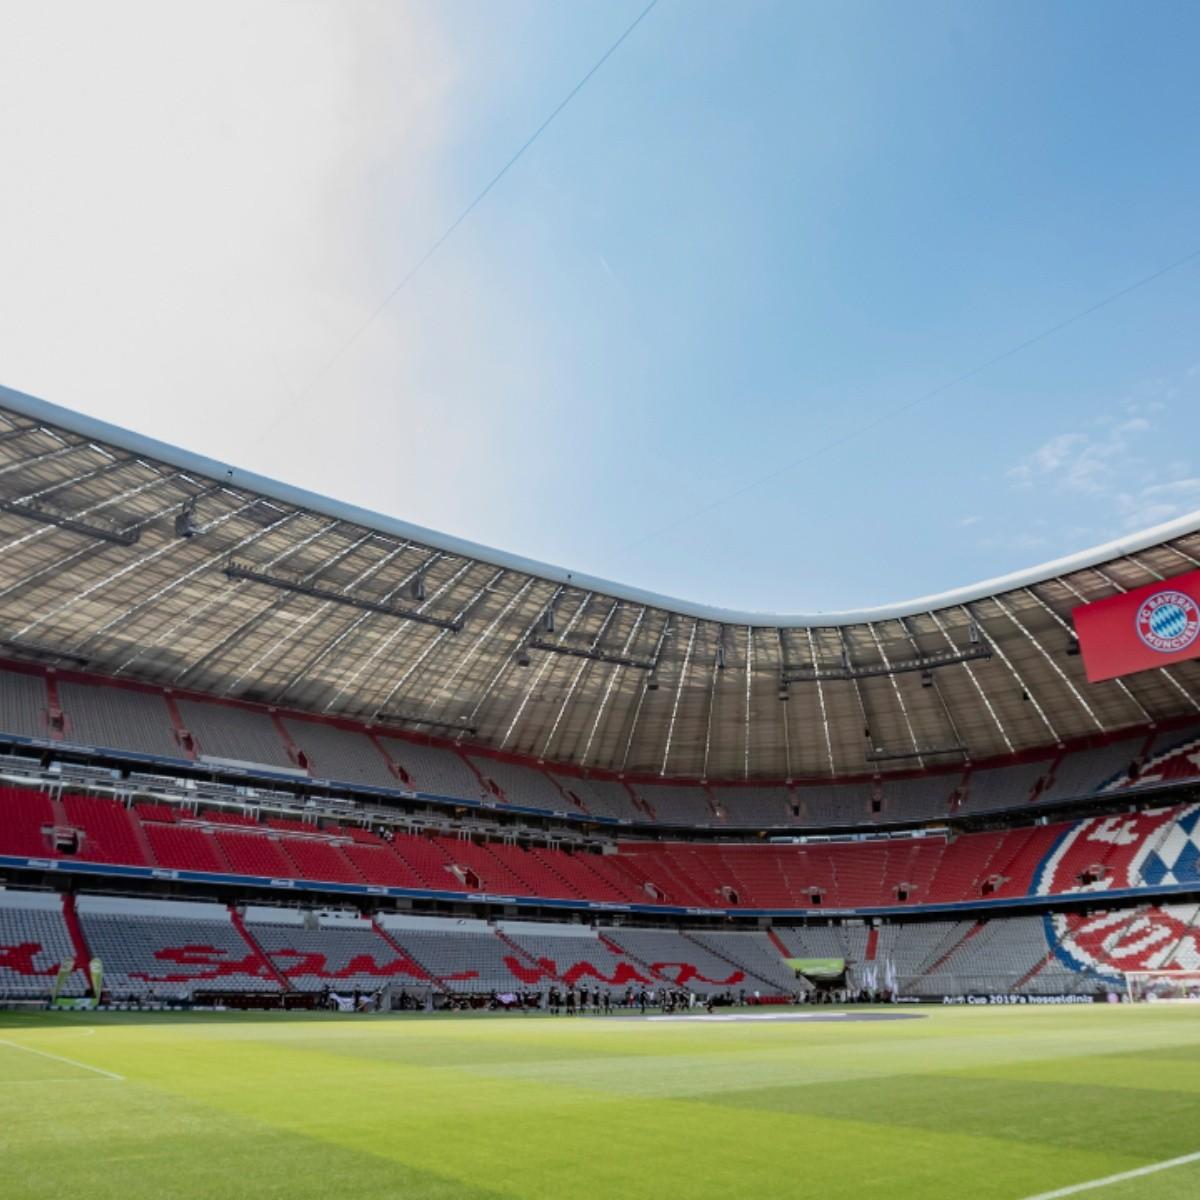 Alineacion De Real Madrid Para Enfrentar Al Tottenham Futbol Centroamerica